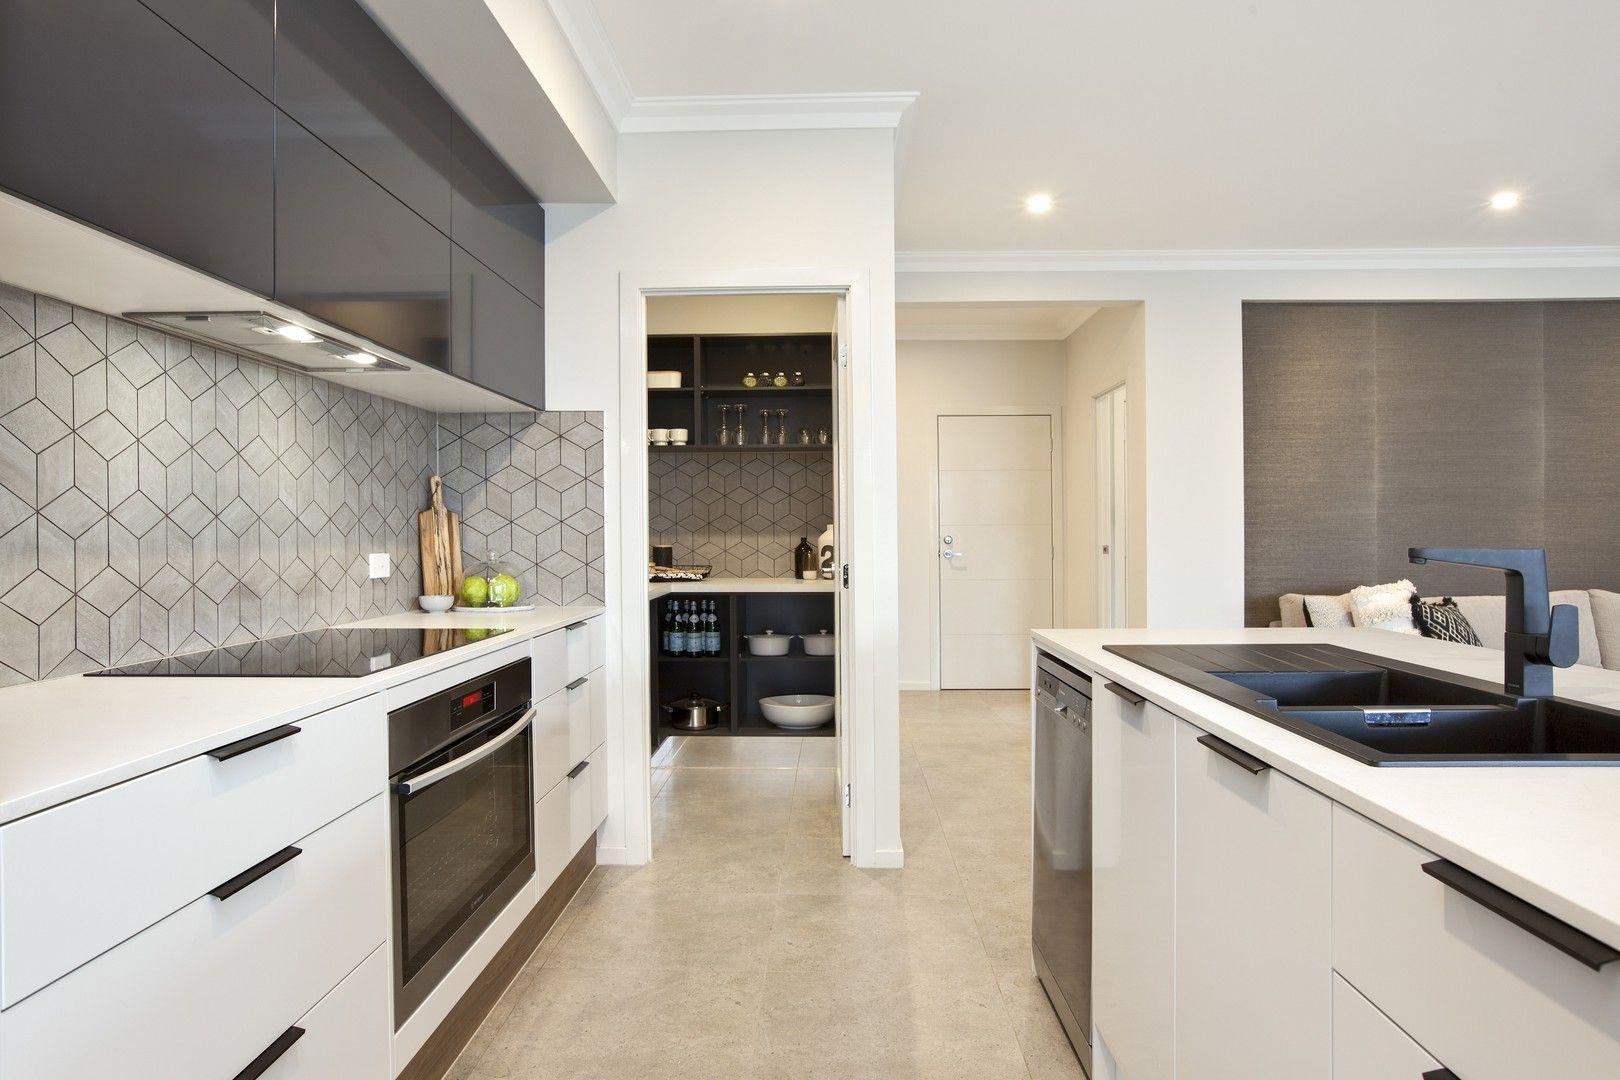 Lot 5205 Gamble Street, Campbelltown NSW 2560, Image 1